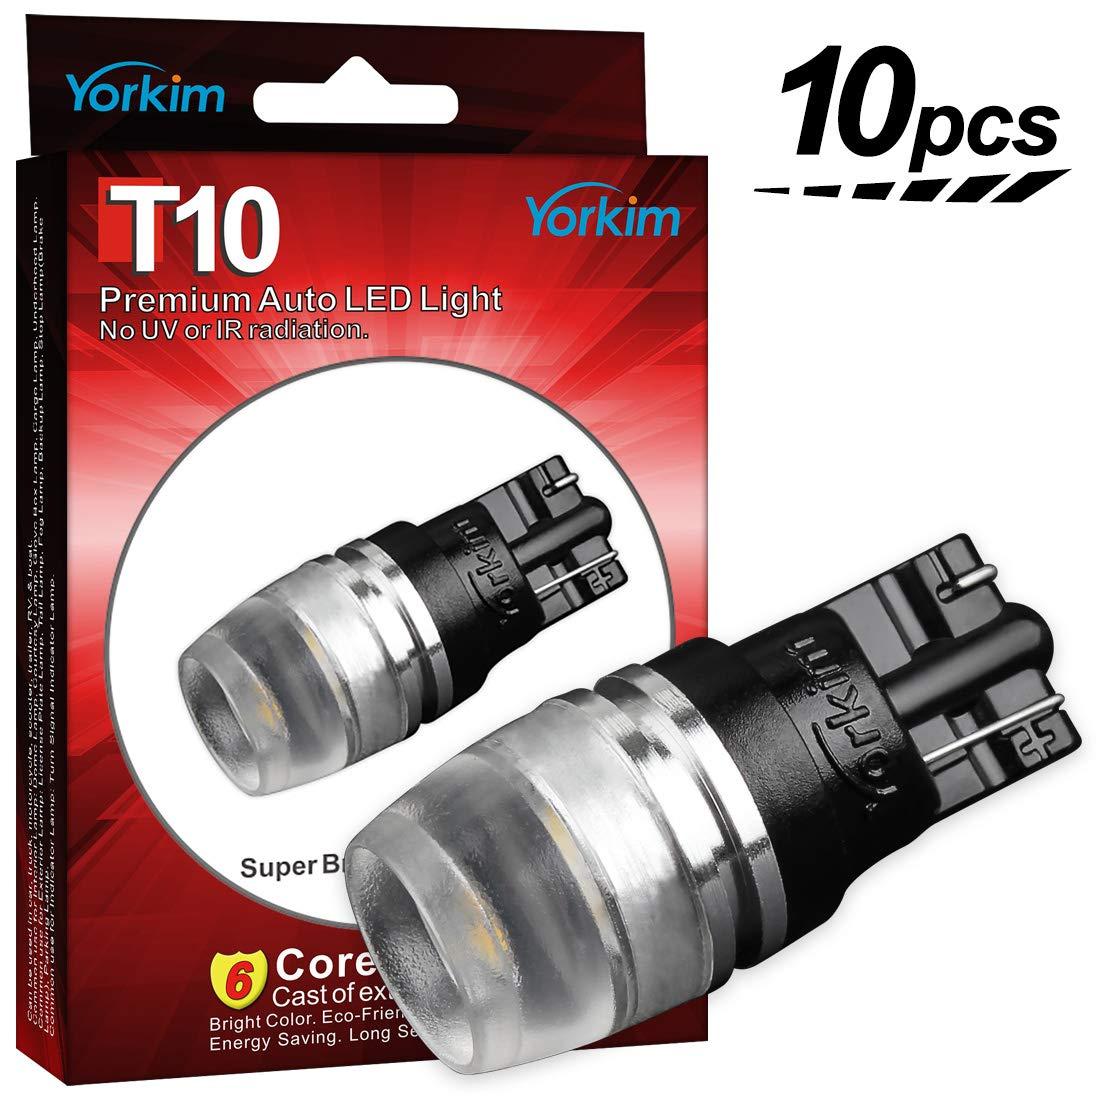 Yorkim T10 LED Light Bulb, High Power Samsung Chips T10 Bulbs for 168 194 W5W 2825 T10 Wedge, White T10 Light Bulb, 168 LED Bulb White, 194 LED Bulb White for Car, Pack of 10 - White